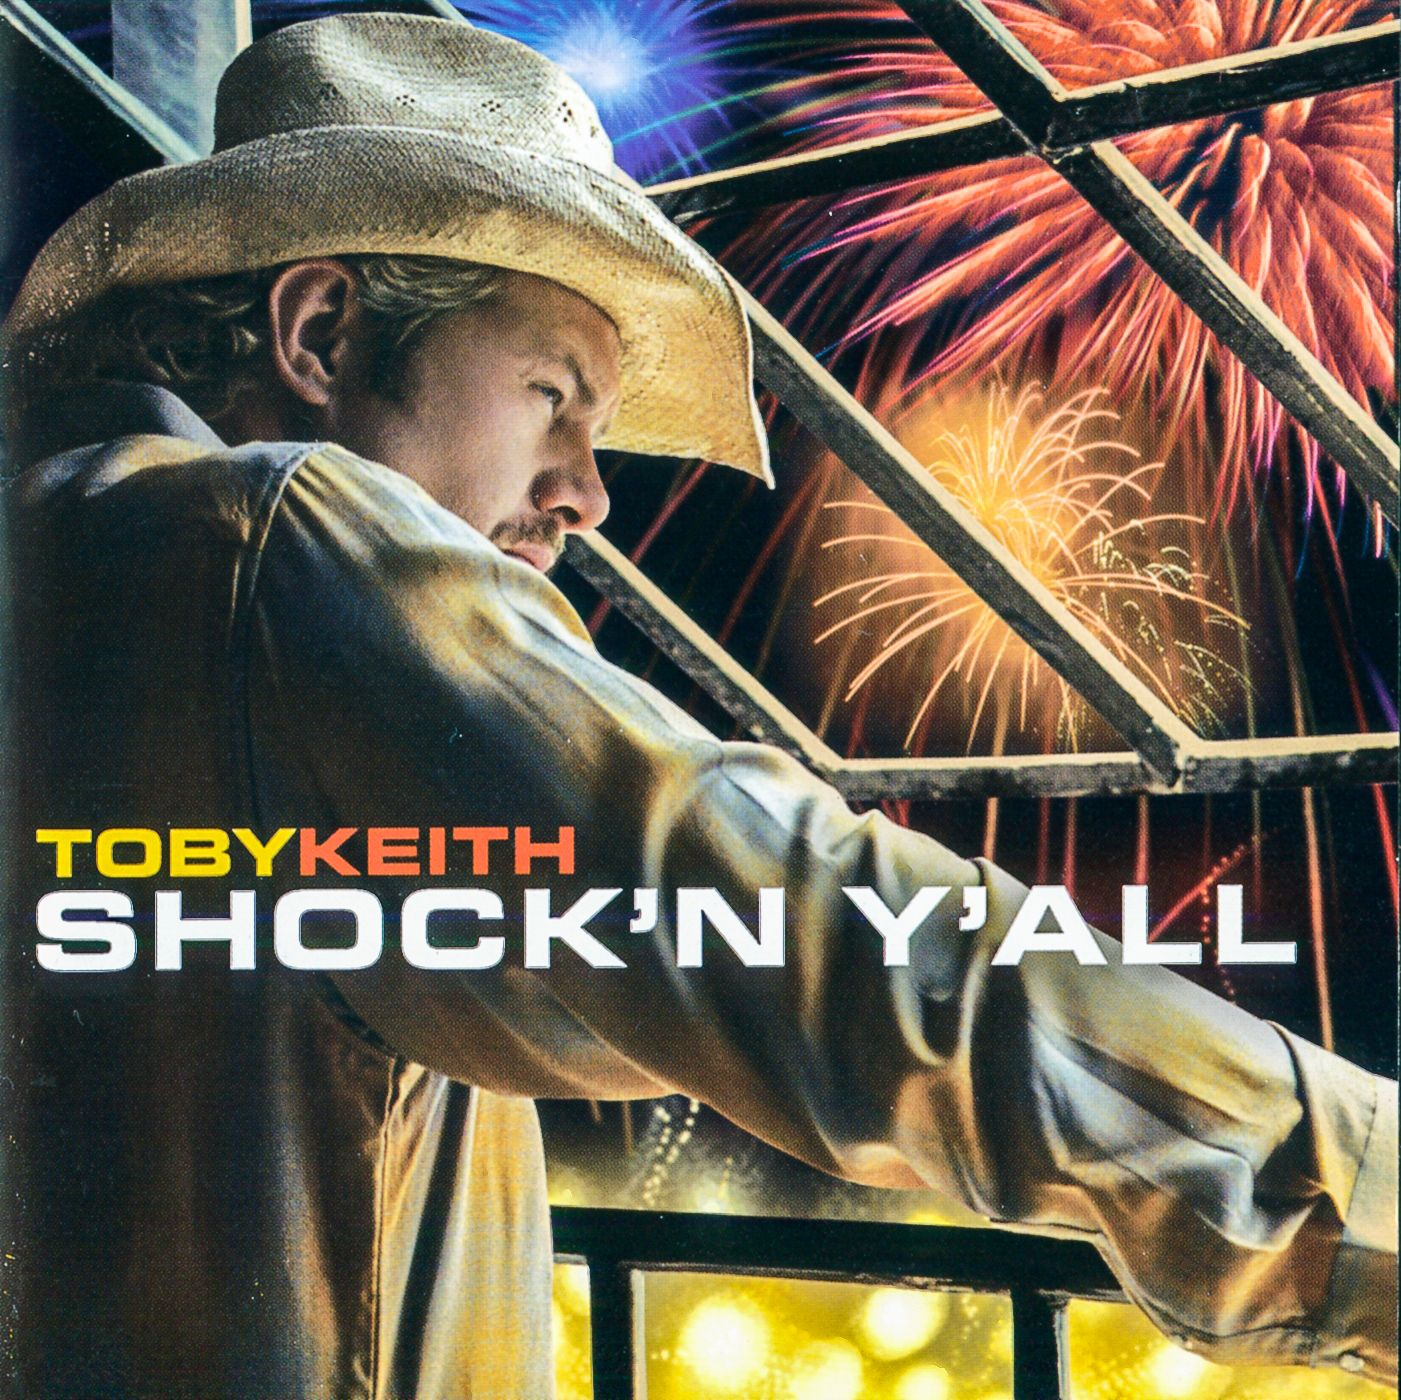 Toby Keith - Shock'N Y'All - Album Cover